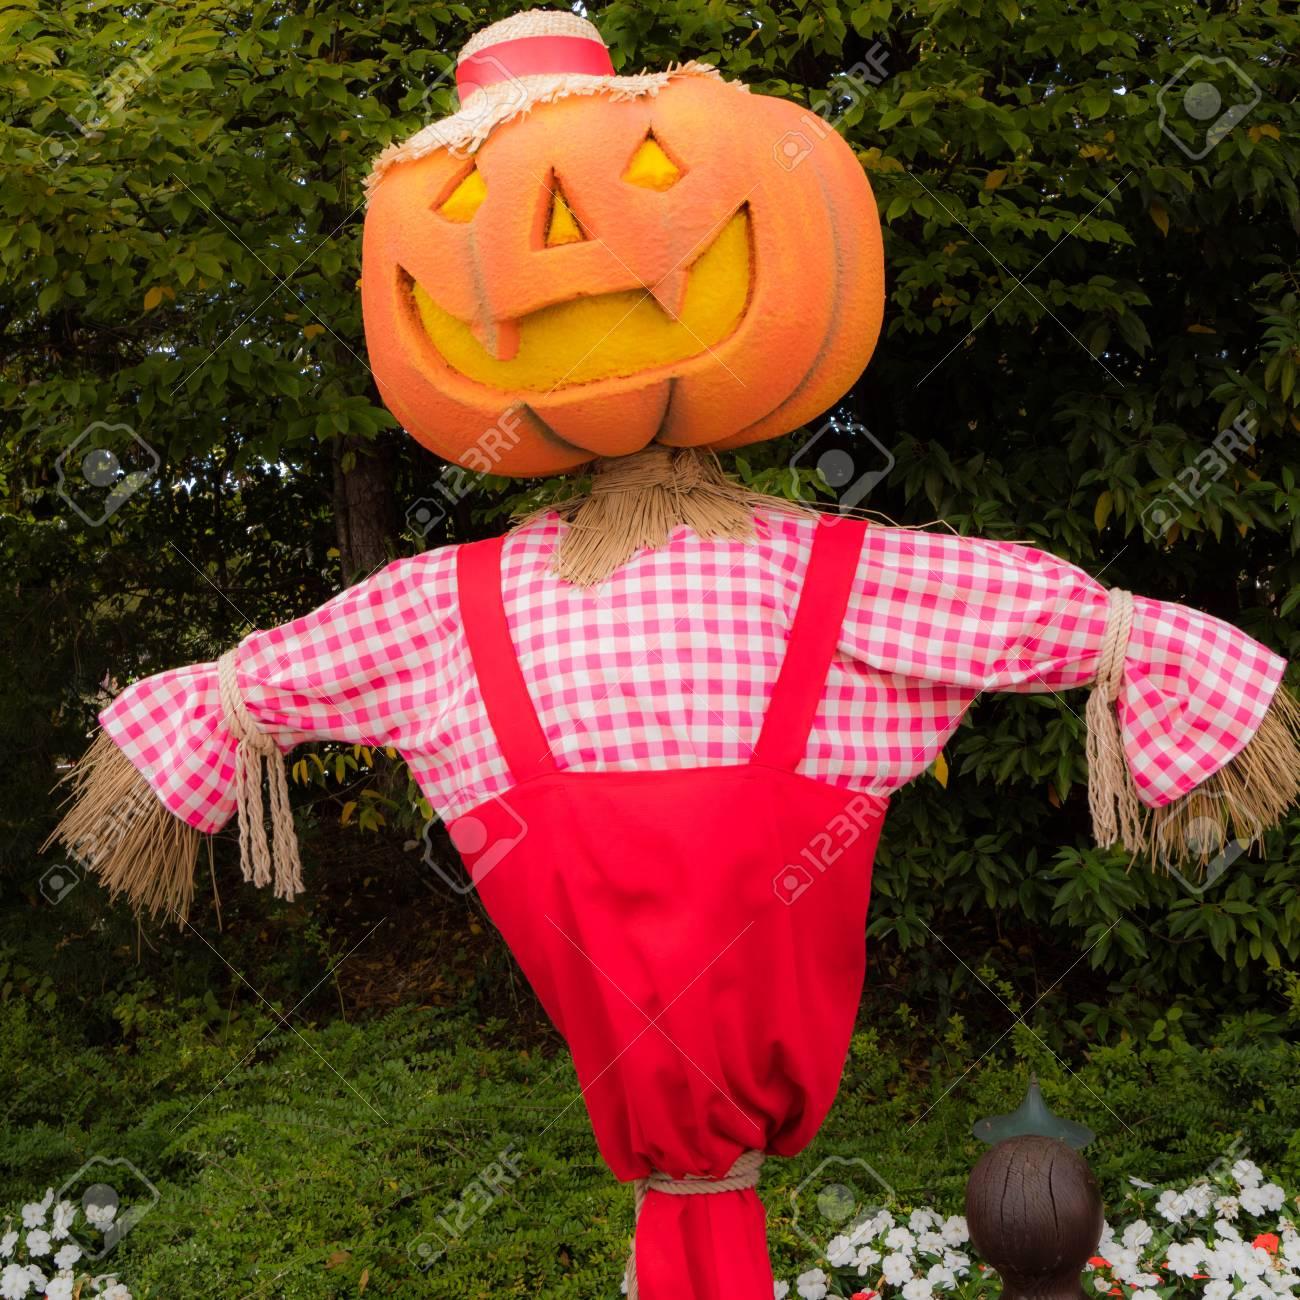 Halloween A Gardaland.Big Pumpkin For Halloween In Gardaland Park Verona Italy